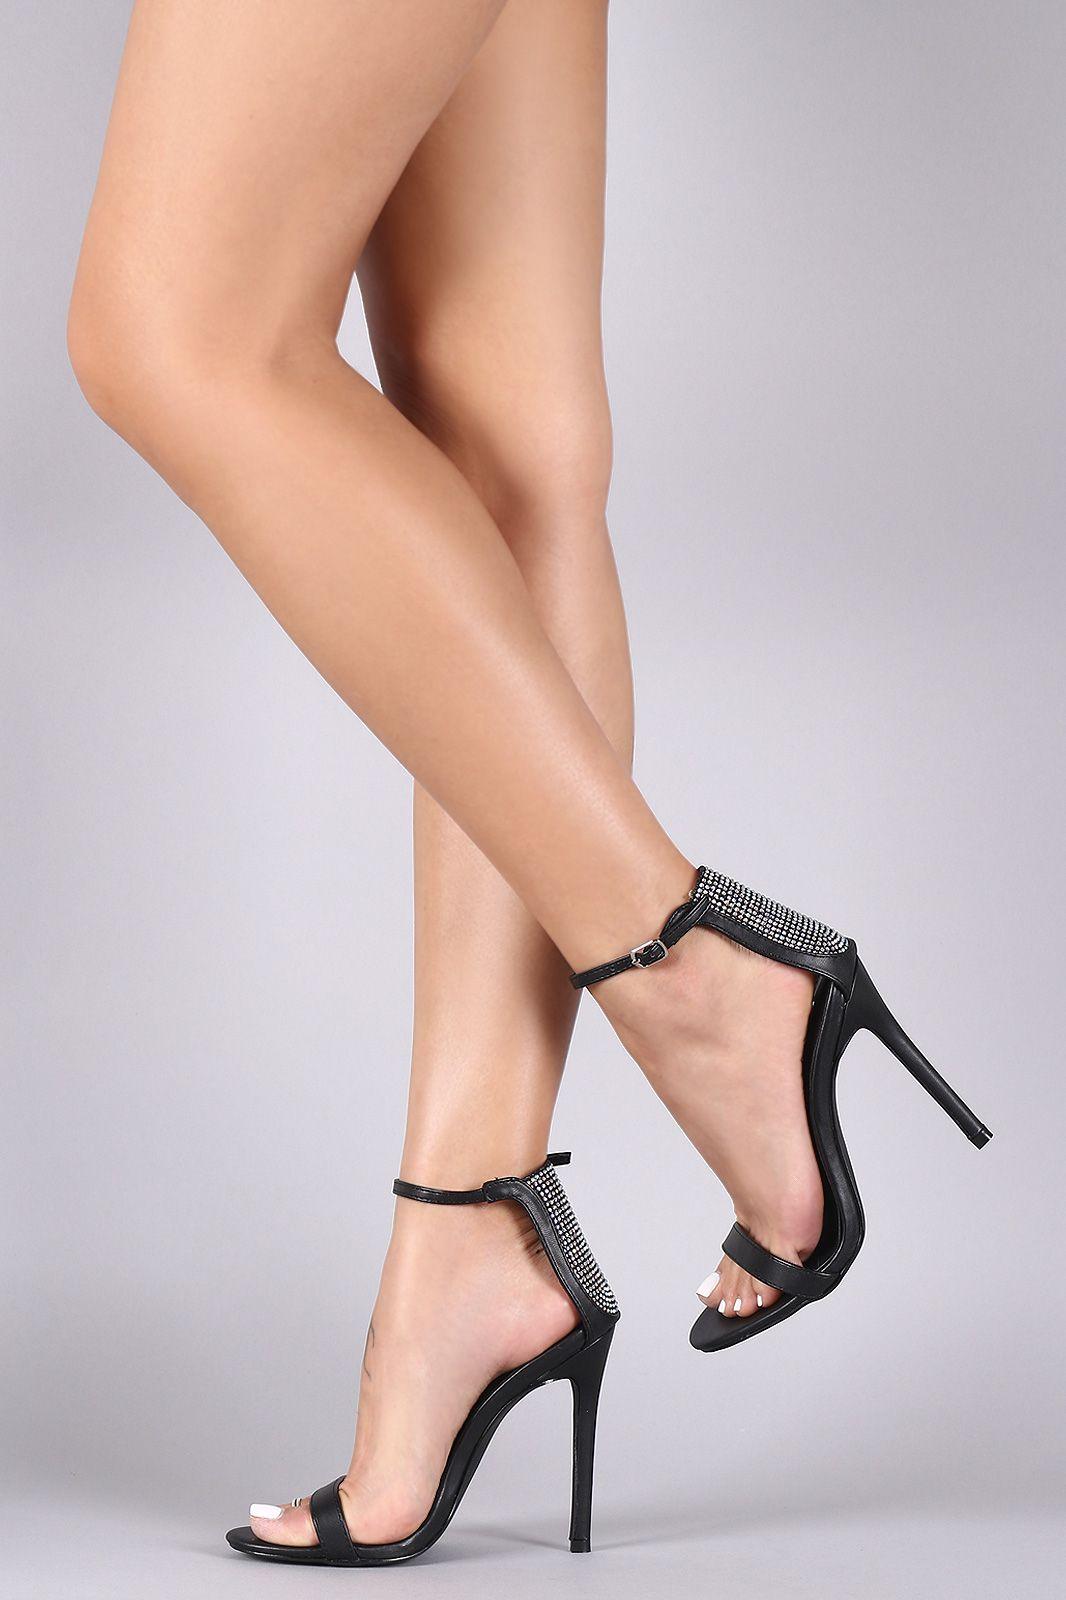 Women Ankle Sandals Dress Pump Rhinestones Hollow Open Toe Stiletto Heel Back Zipper High Heels Sandals Memela